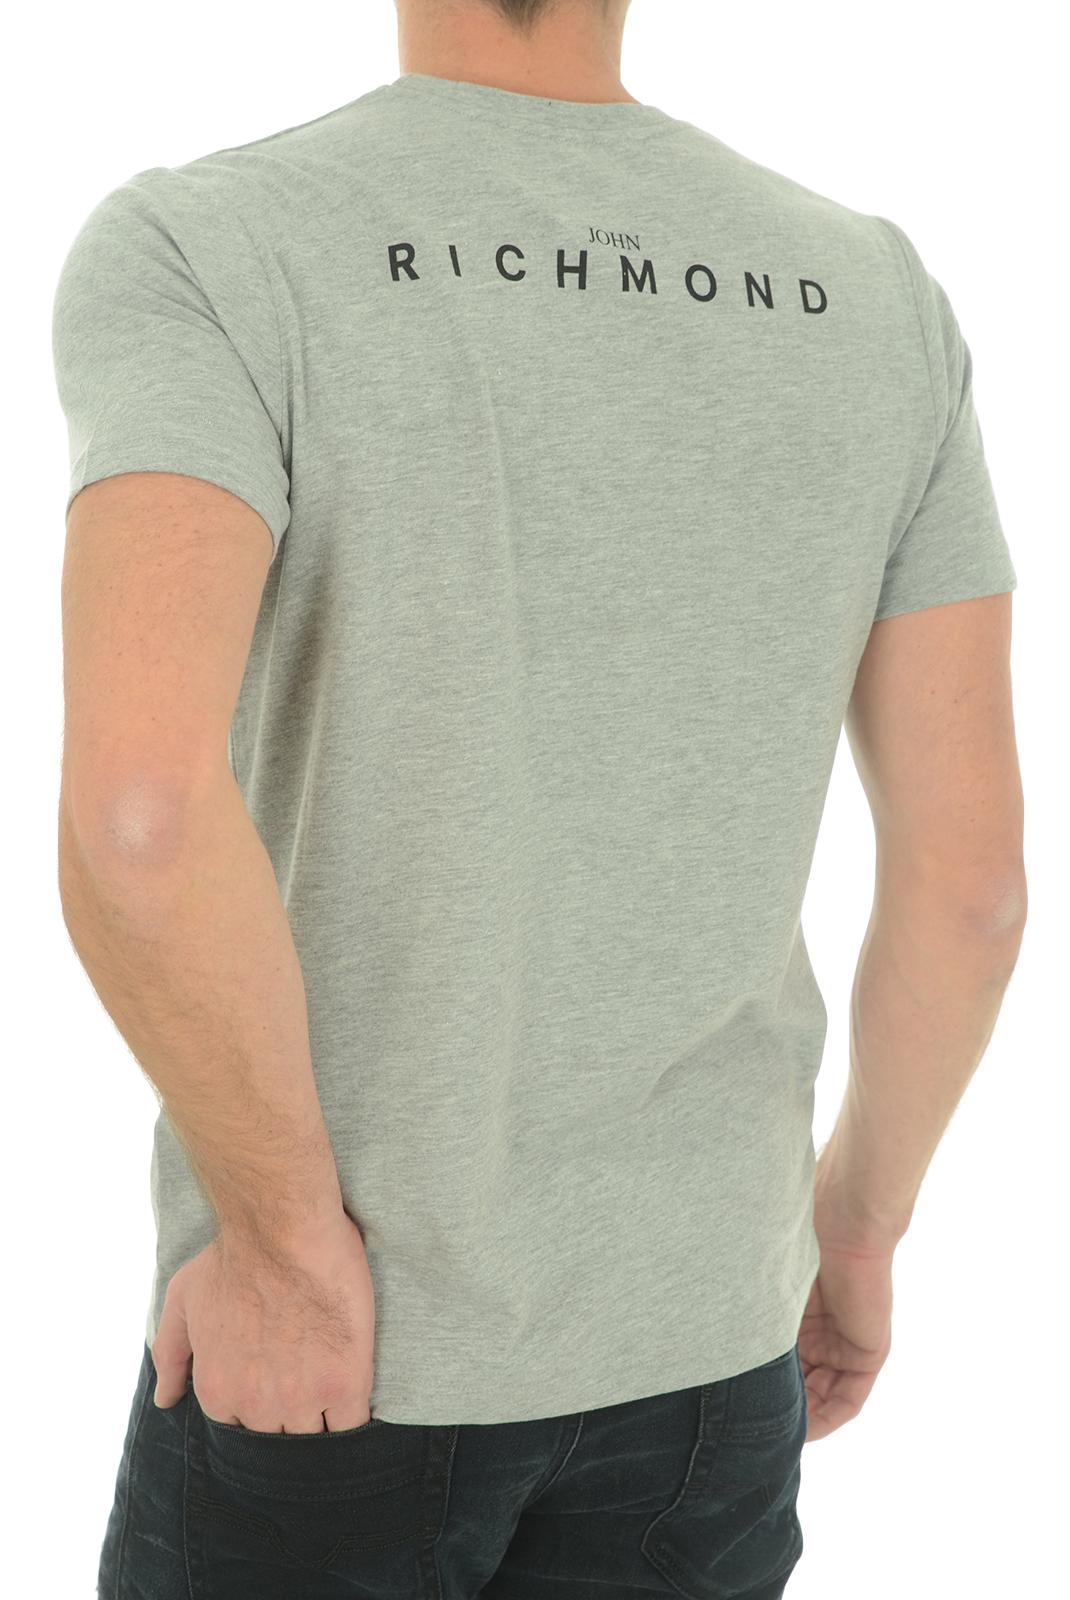 Tee-shirts  John richmond SILVANIA W0066 GRIGIO MEL